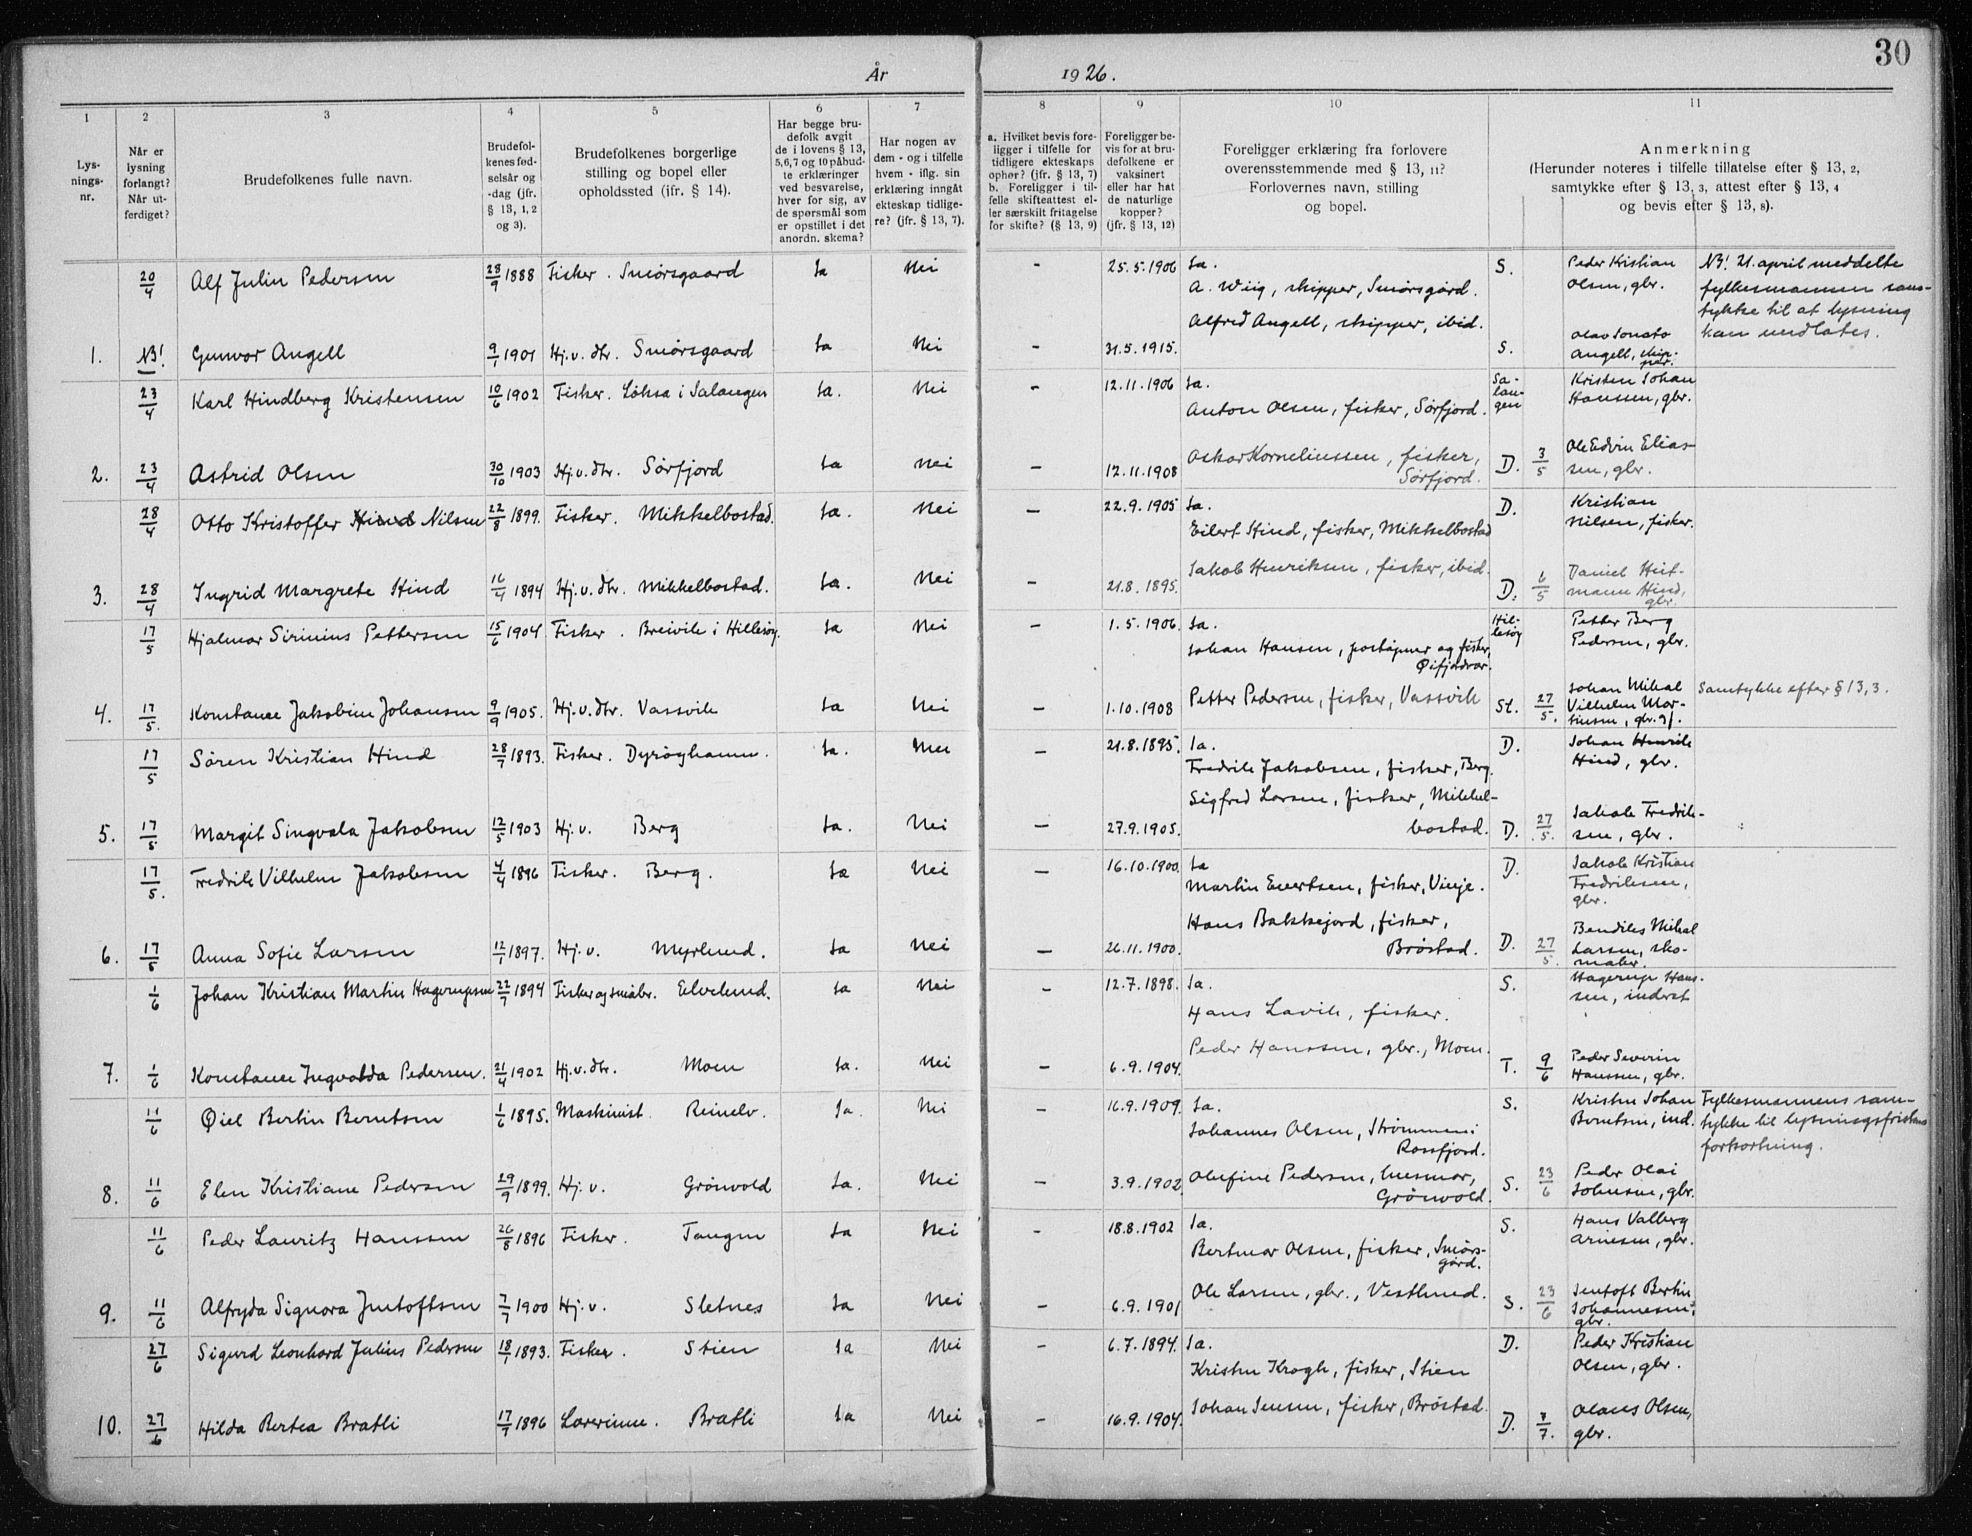 SATØ, Tranøy sokneprestkontor, J/Jc/L0053: Lysningsprotokoll nr. 53, 1919-1940, s. 30